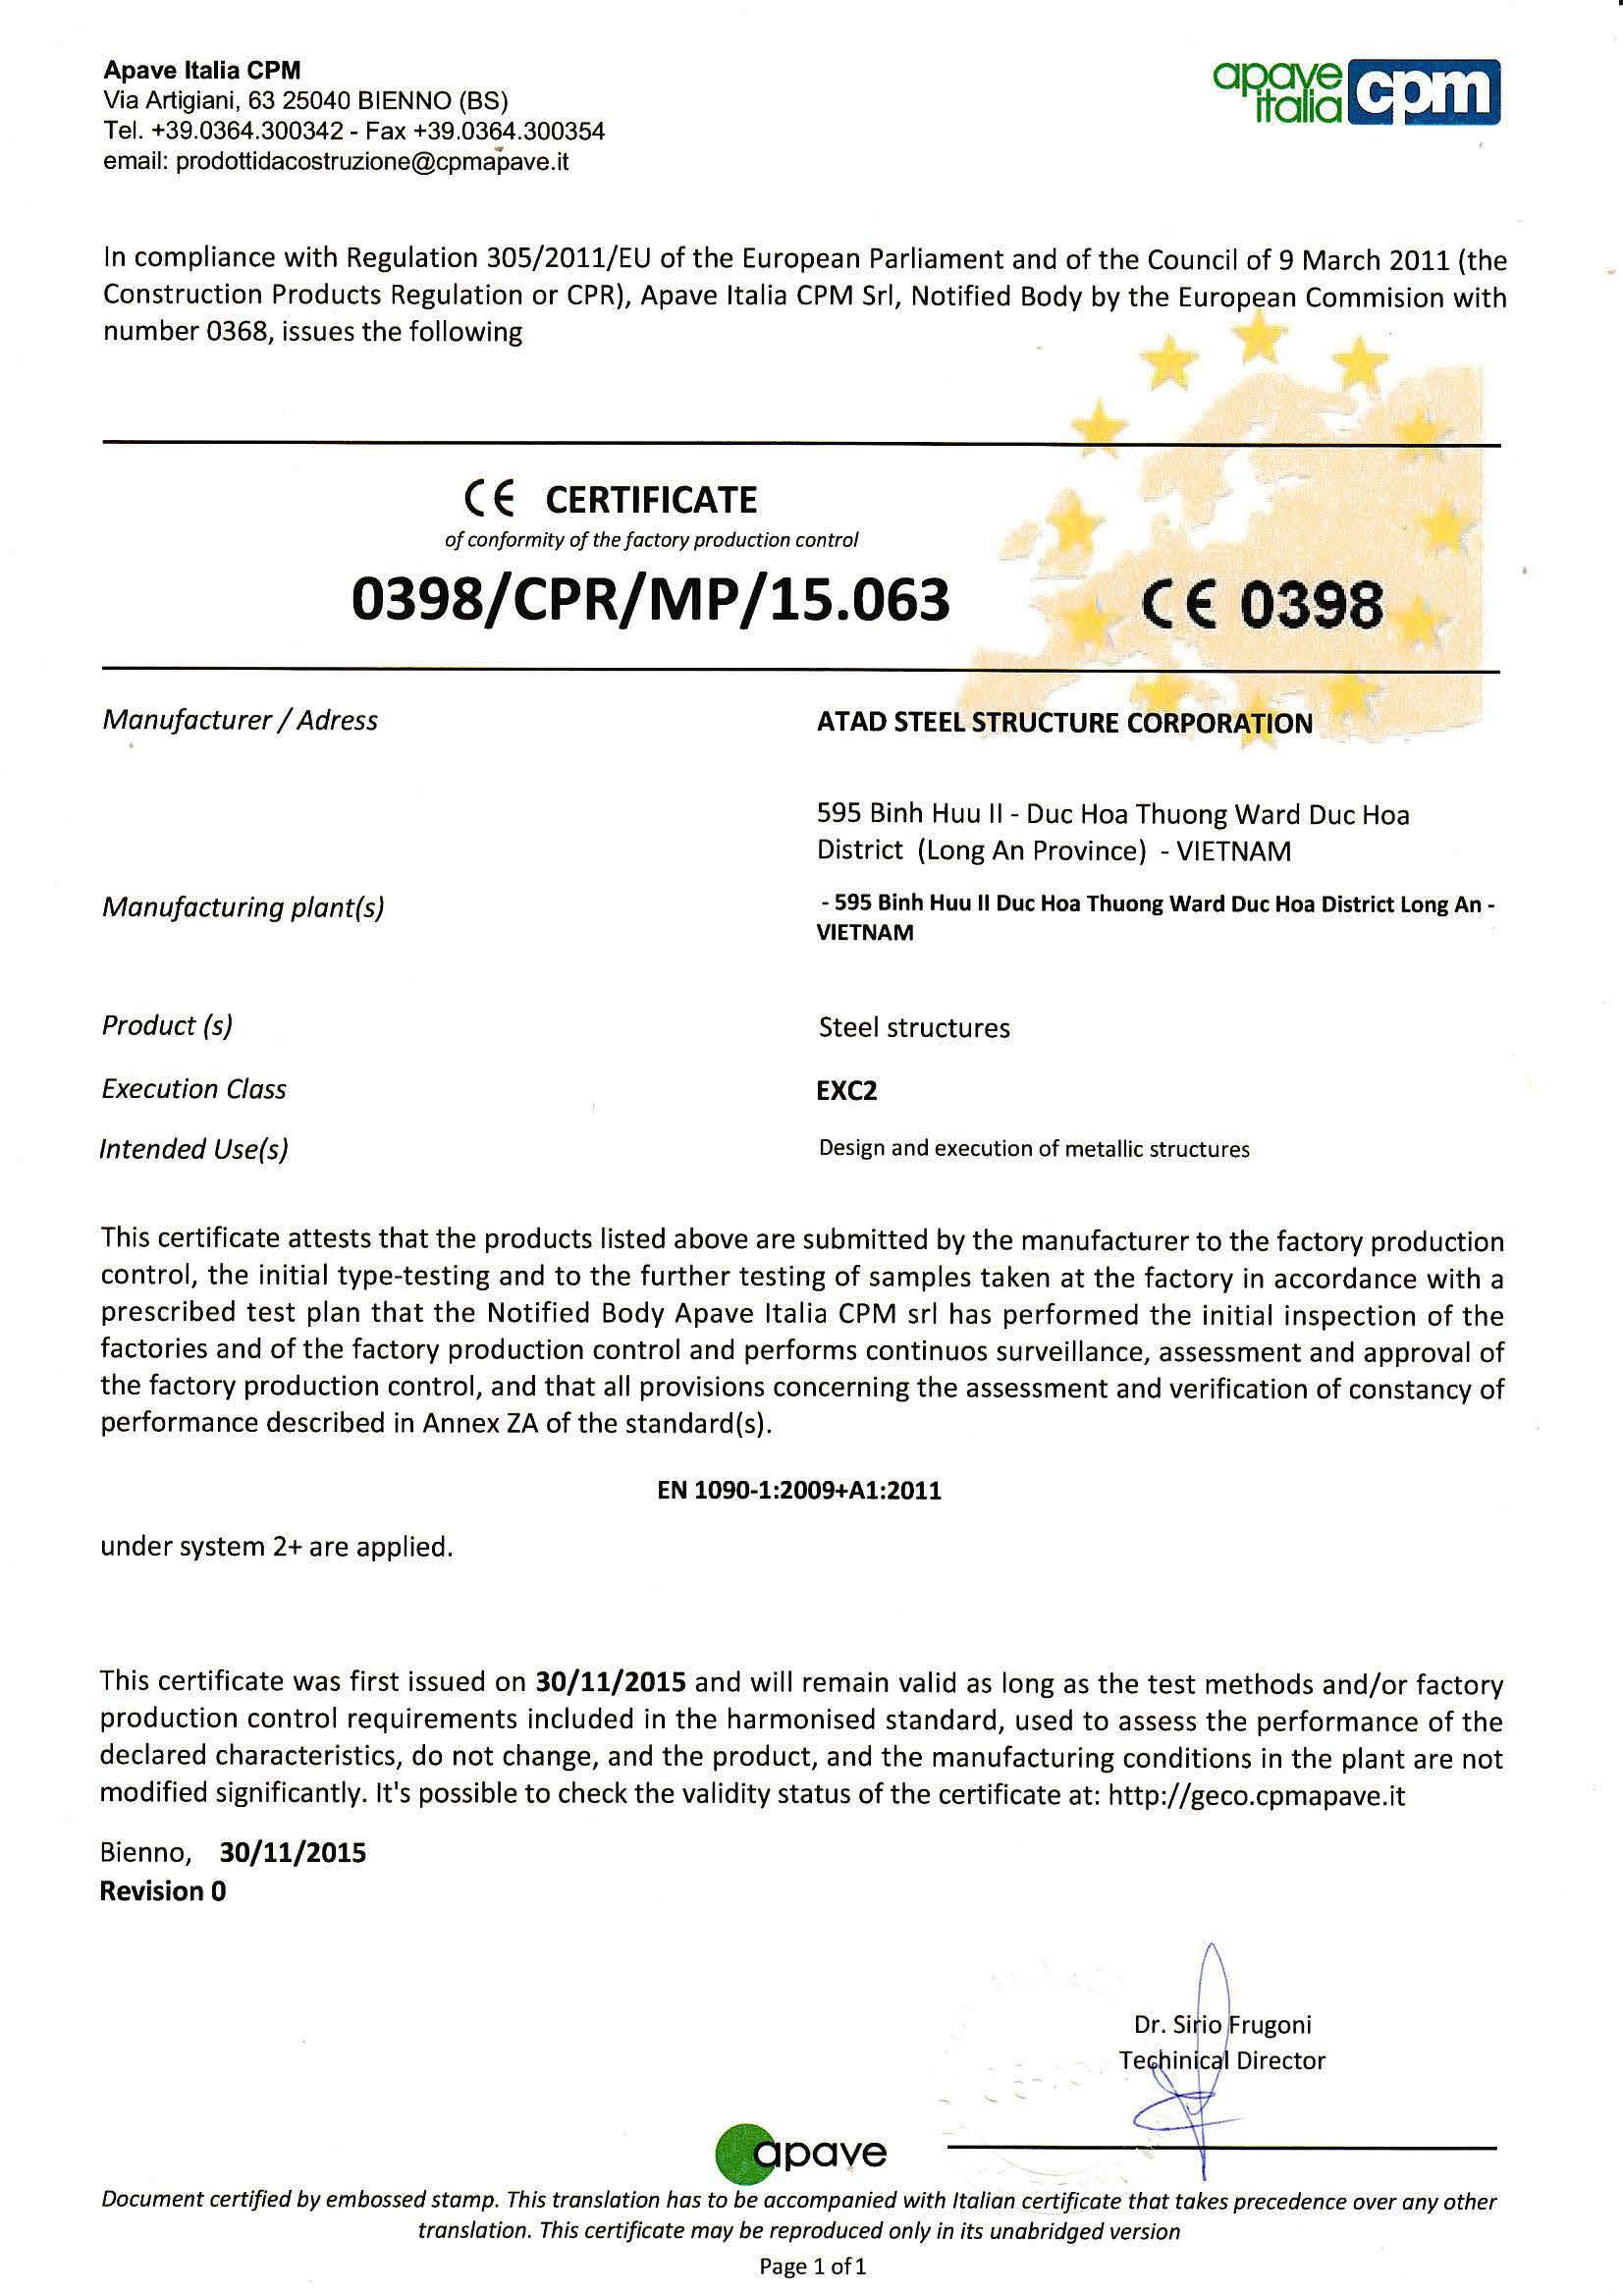 EN1090 EXC2 CERTIFICATE (ENGLISH)